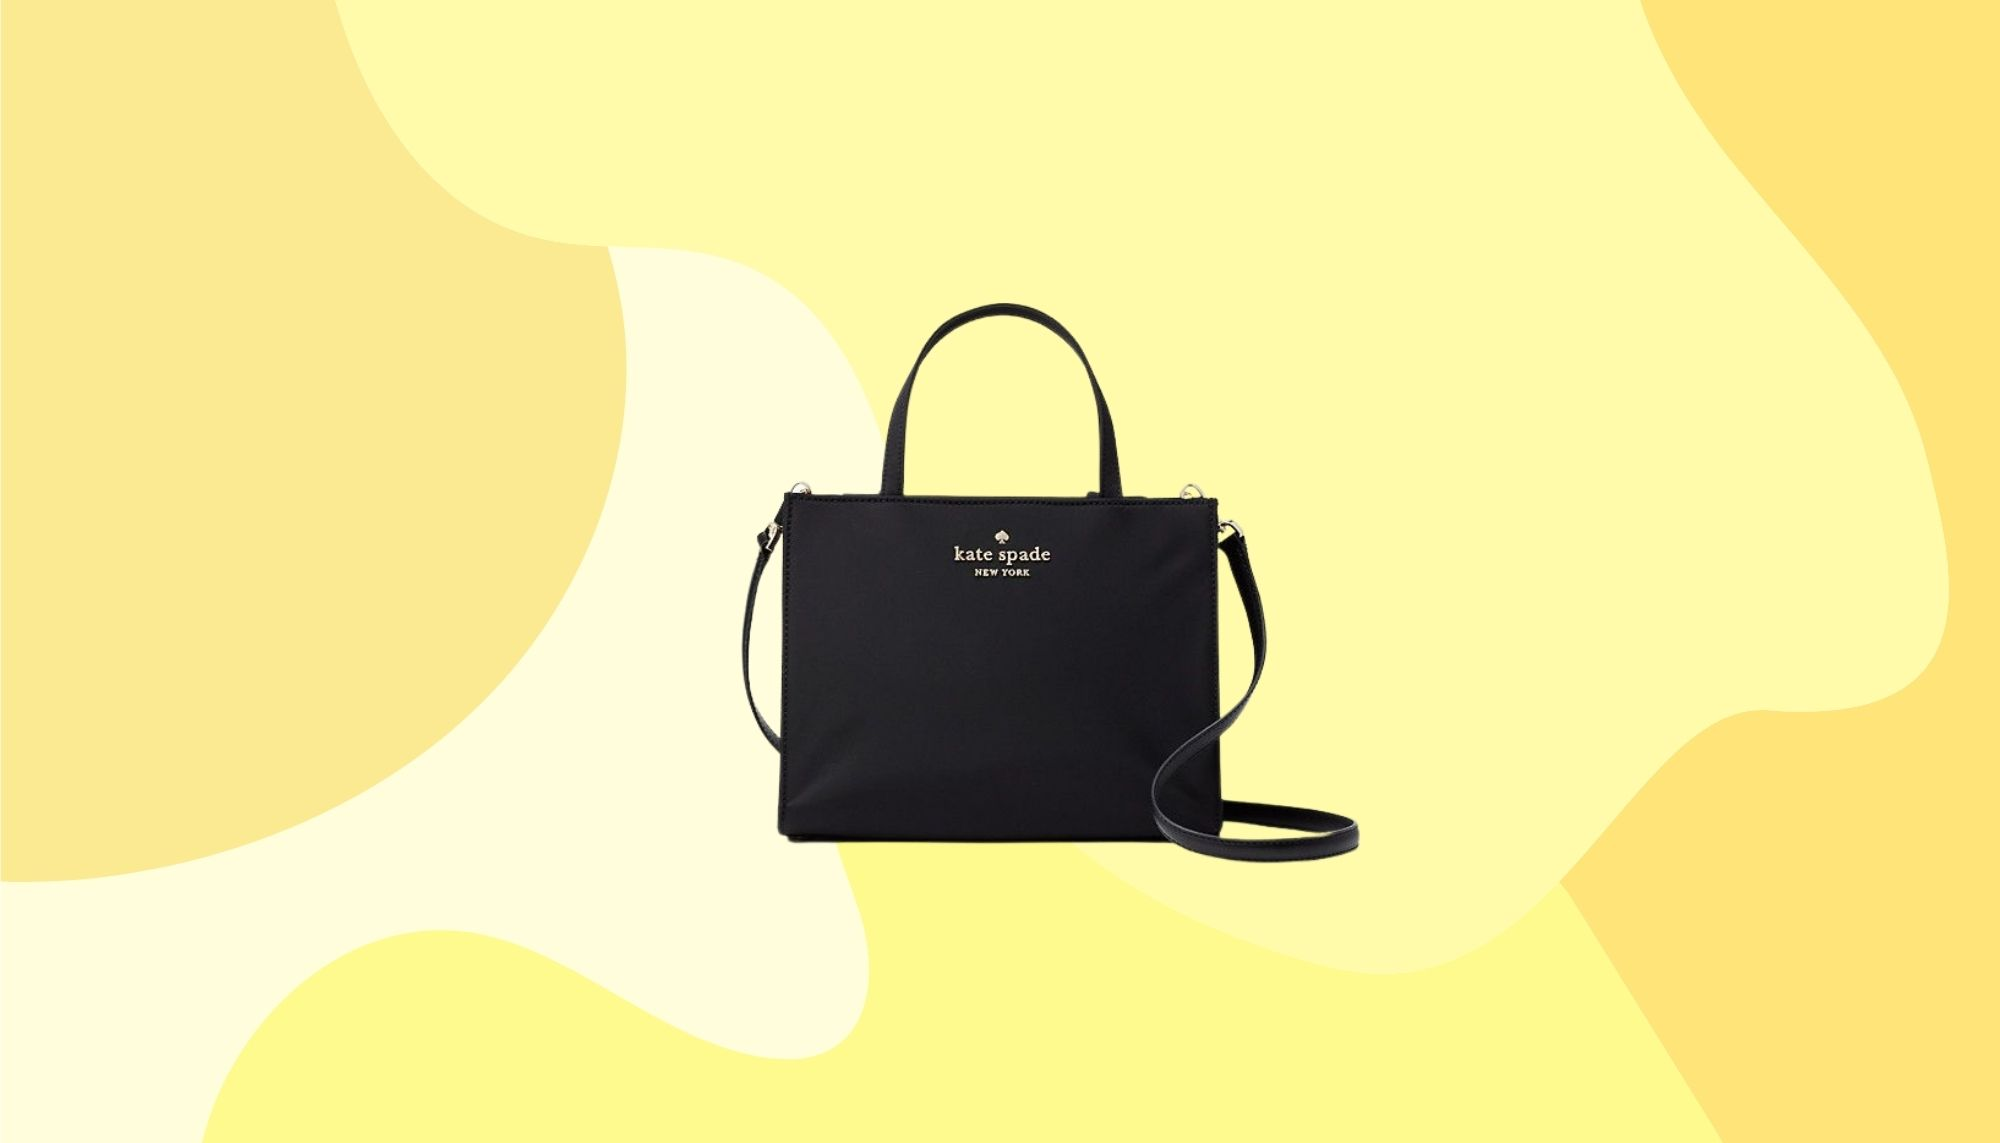 10 Brands like Kate Spade (Affordable Luxury)